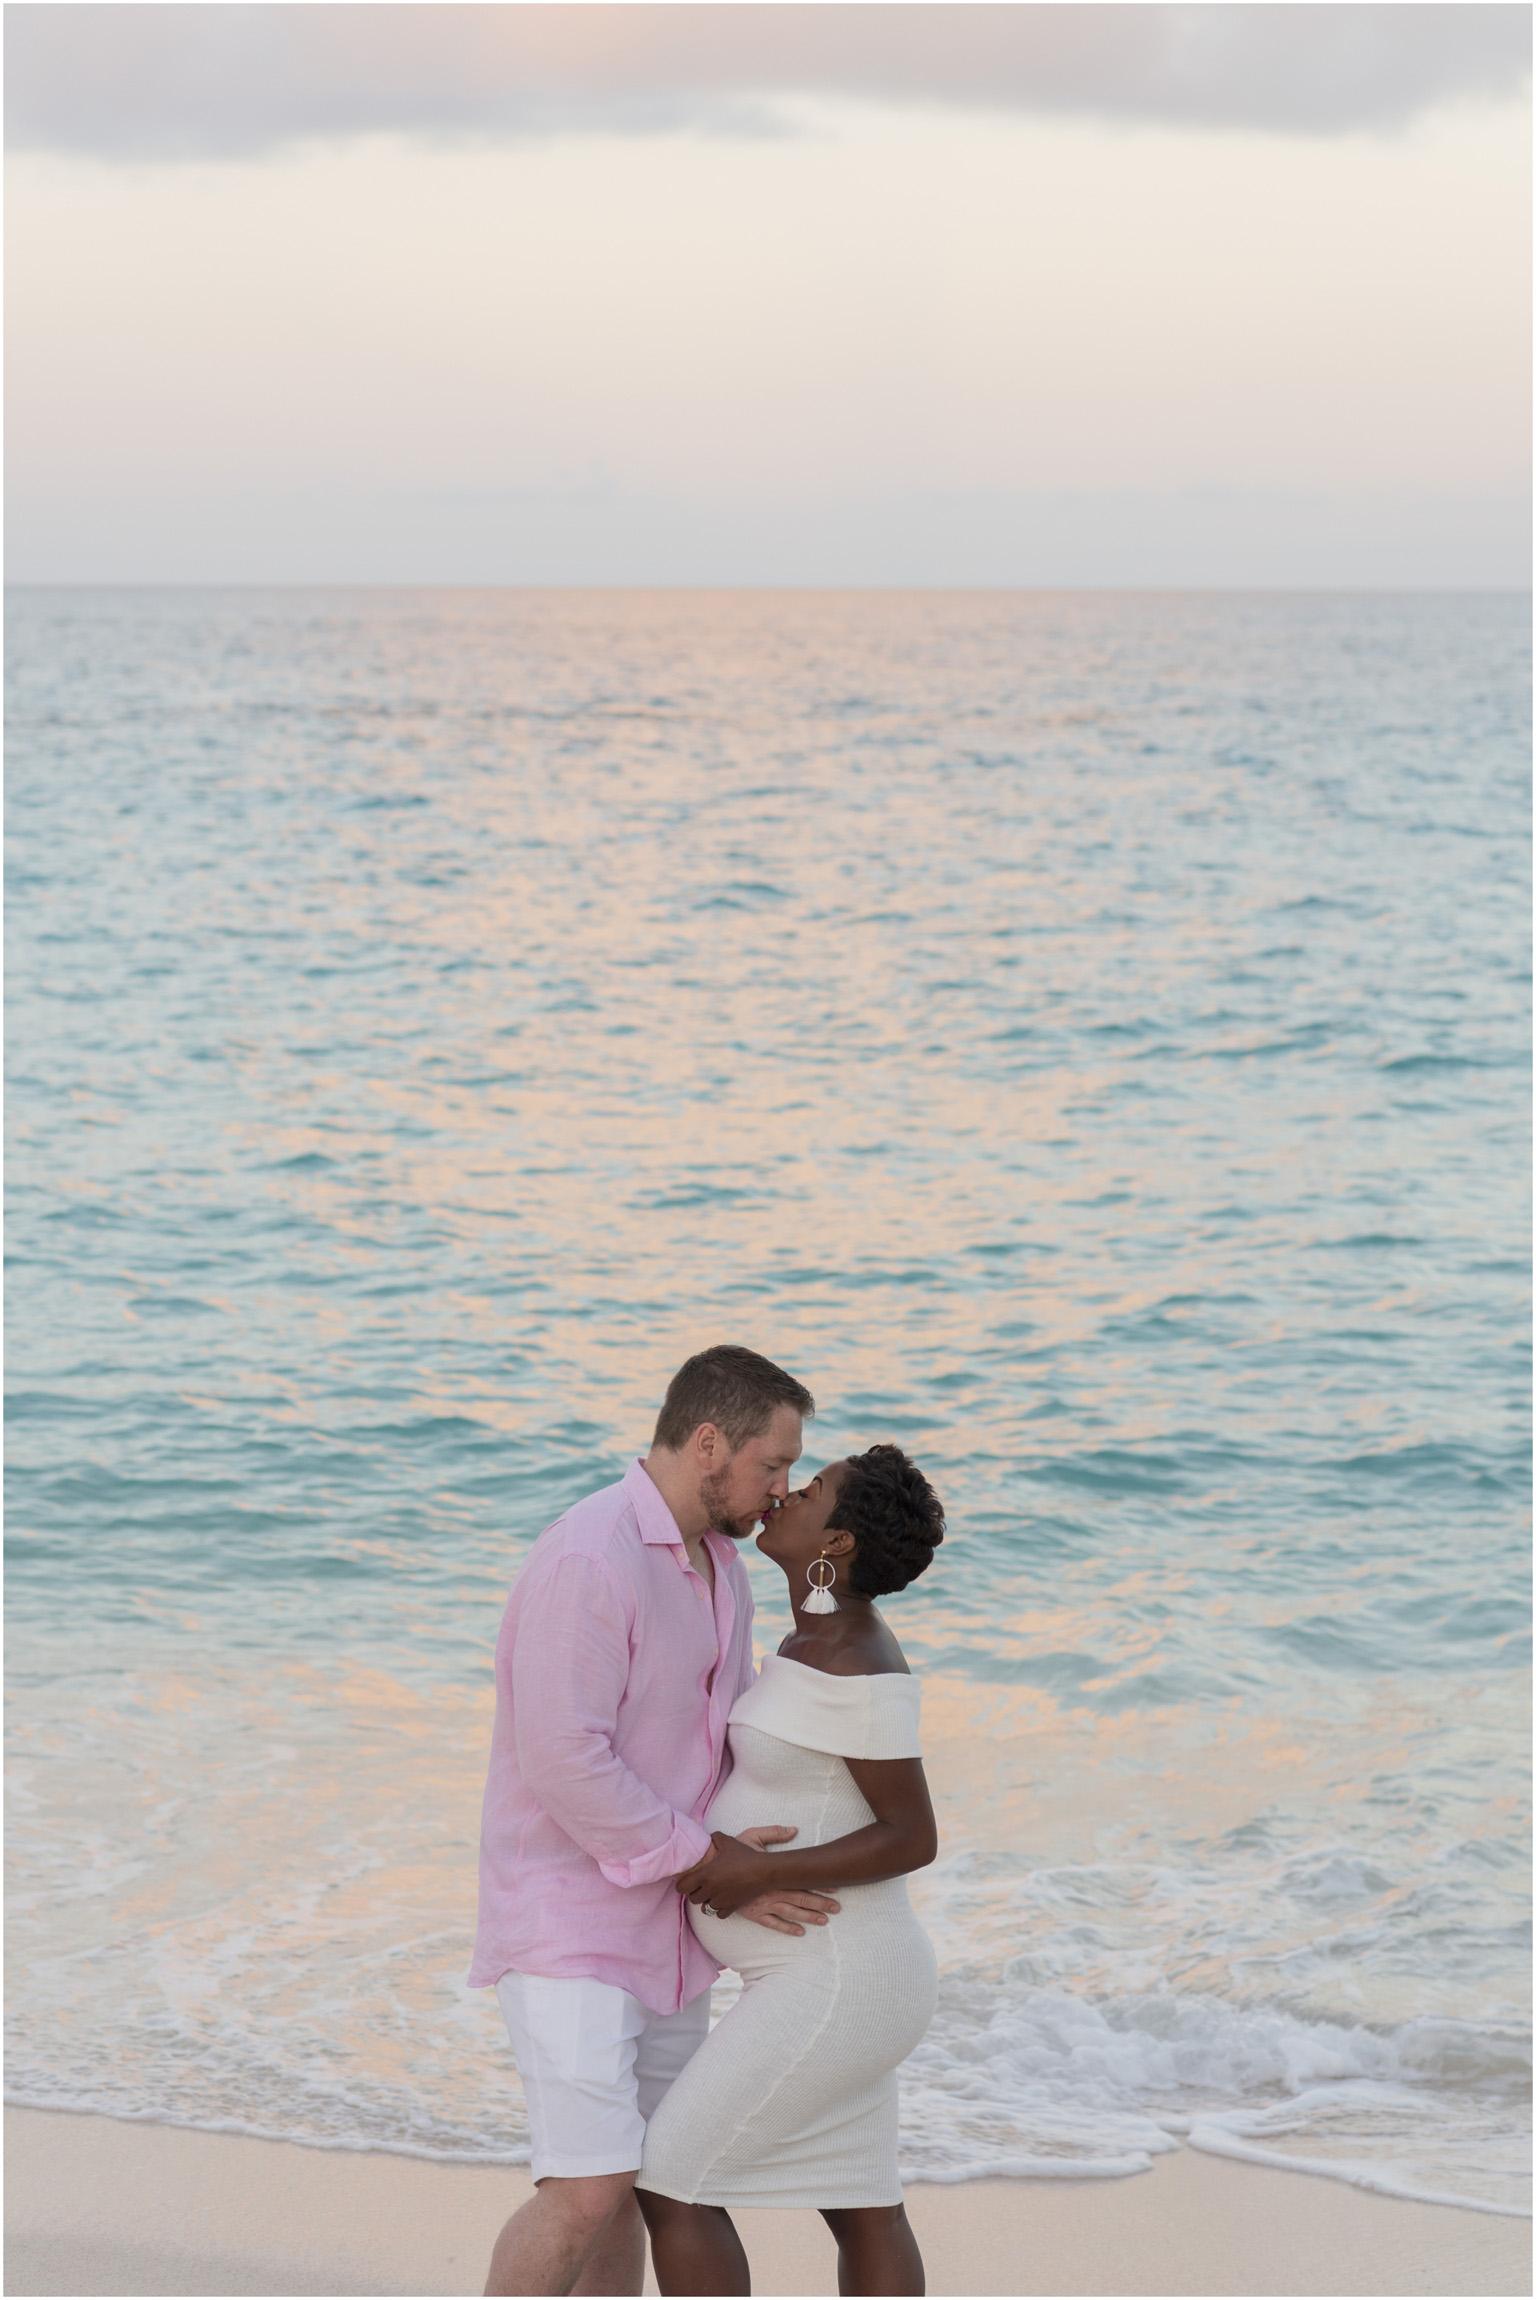 ©FianderFoto_Bermuda Maternity Photographer_Jennifer_Jonathan_045.jpg